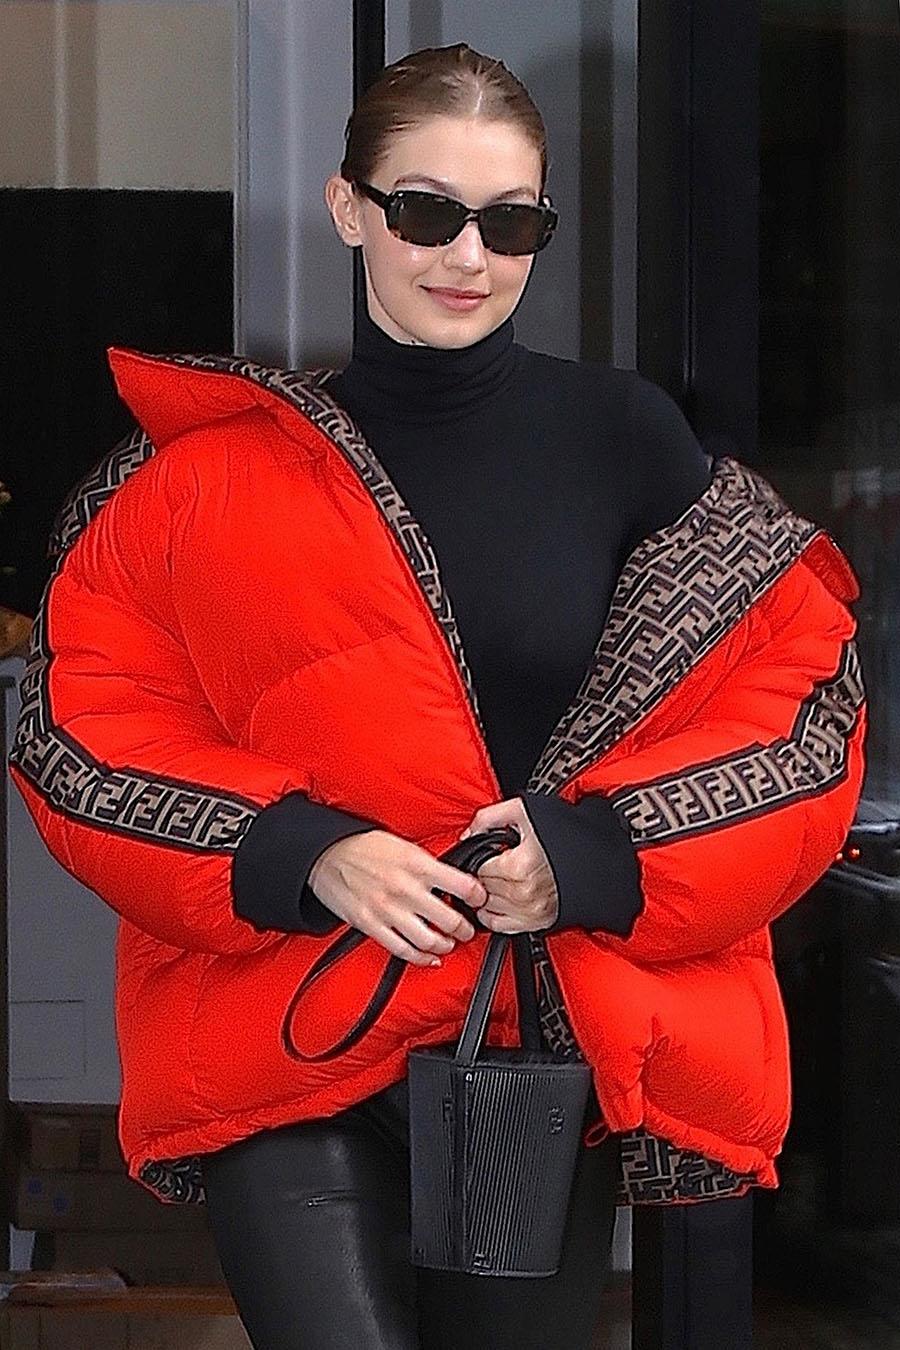 Celebs Out About Nicki Minaj Blac Chyna Gigi Hadid Nia Inside Flats Khaky 40 Supermodel Was Seen Leaving Her New York City Apartment Building Dressed In A Stylish Orange Fendi Bubble Coat With Black Leggings